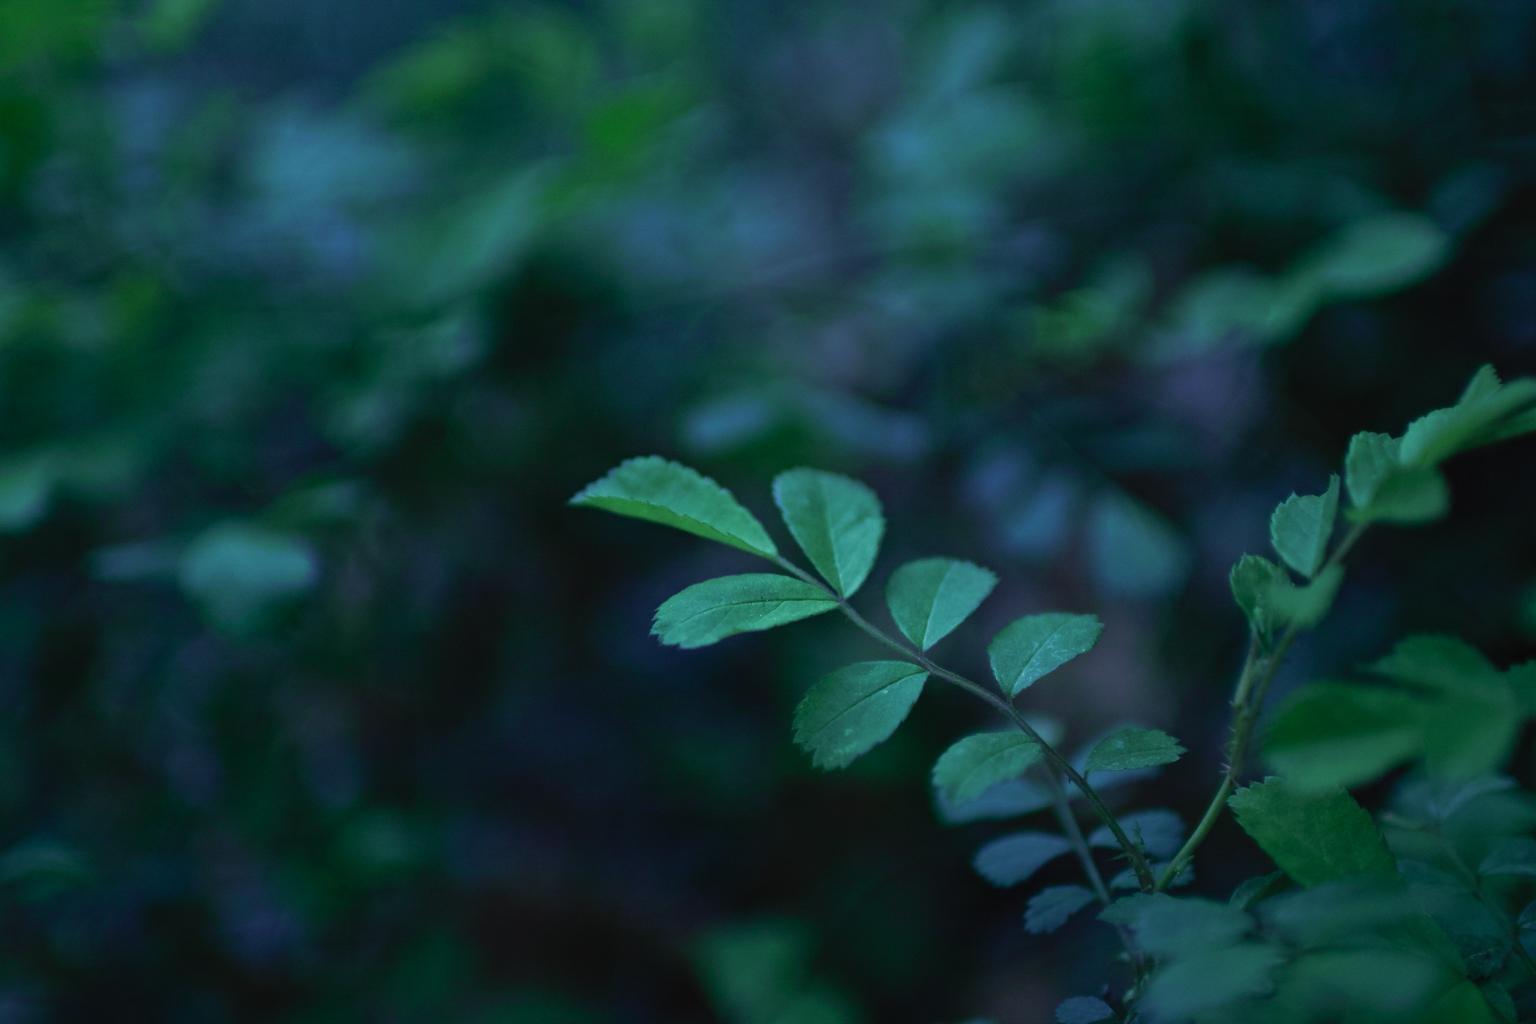 【SIGMA】FOVEONで植物撮影